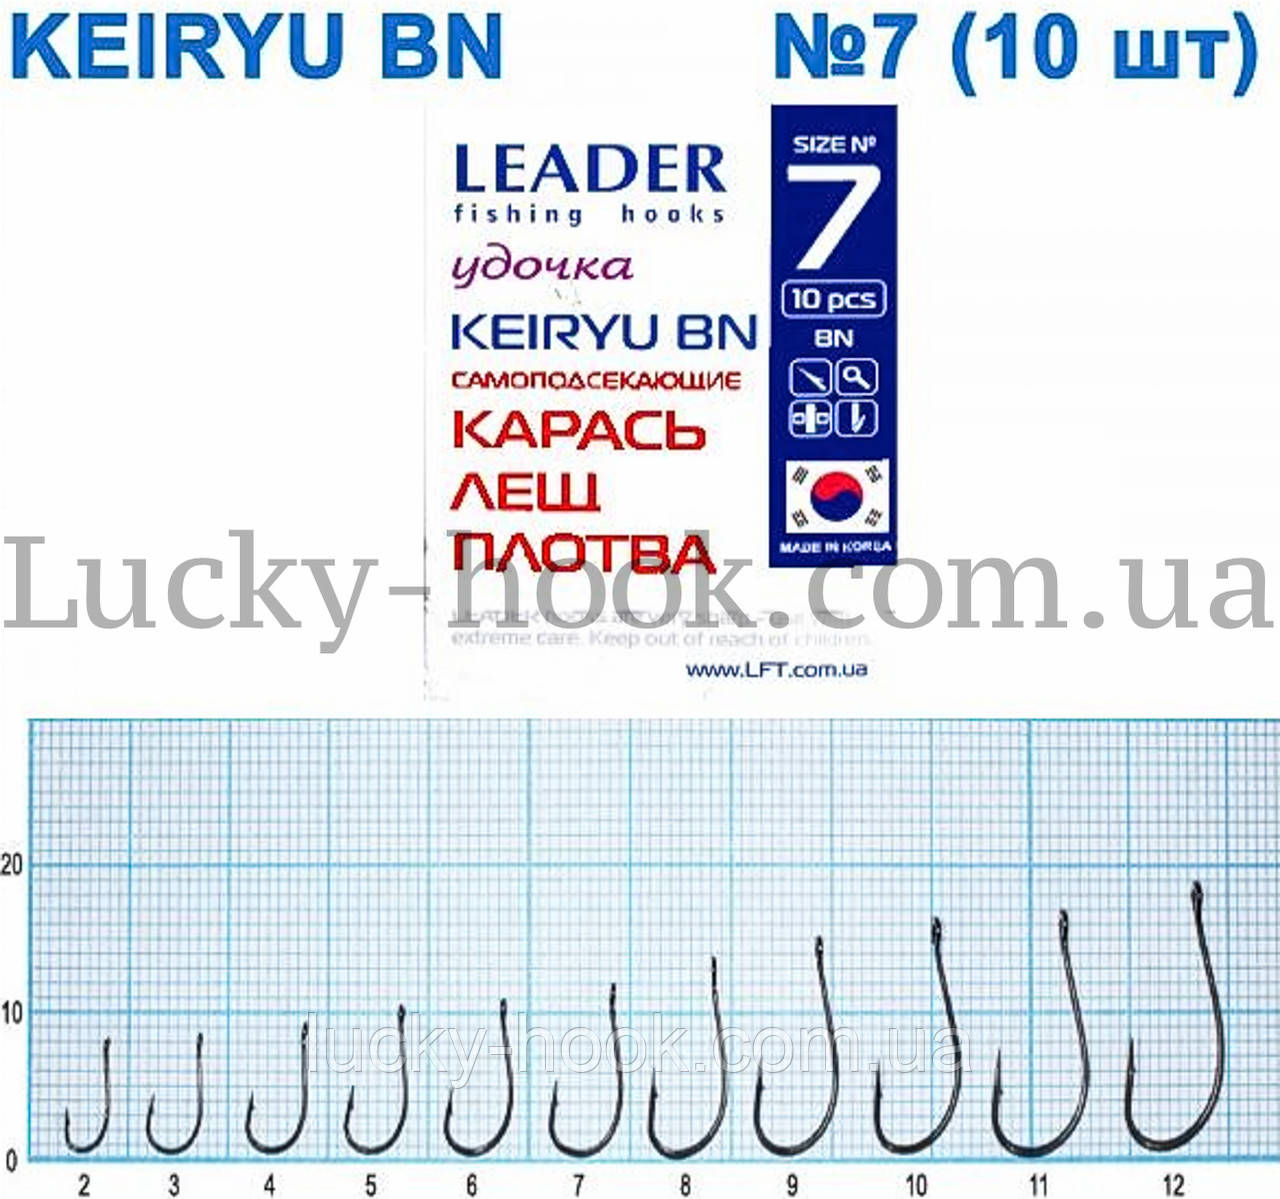 Крючок Leader KEIRYU BN самоподсекающие (карась, лещ, плотва) № 7